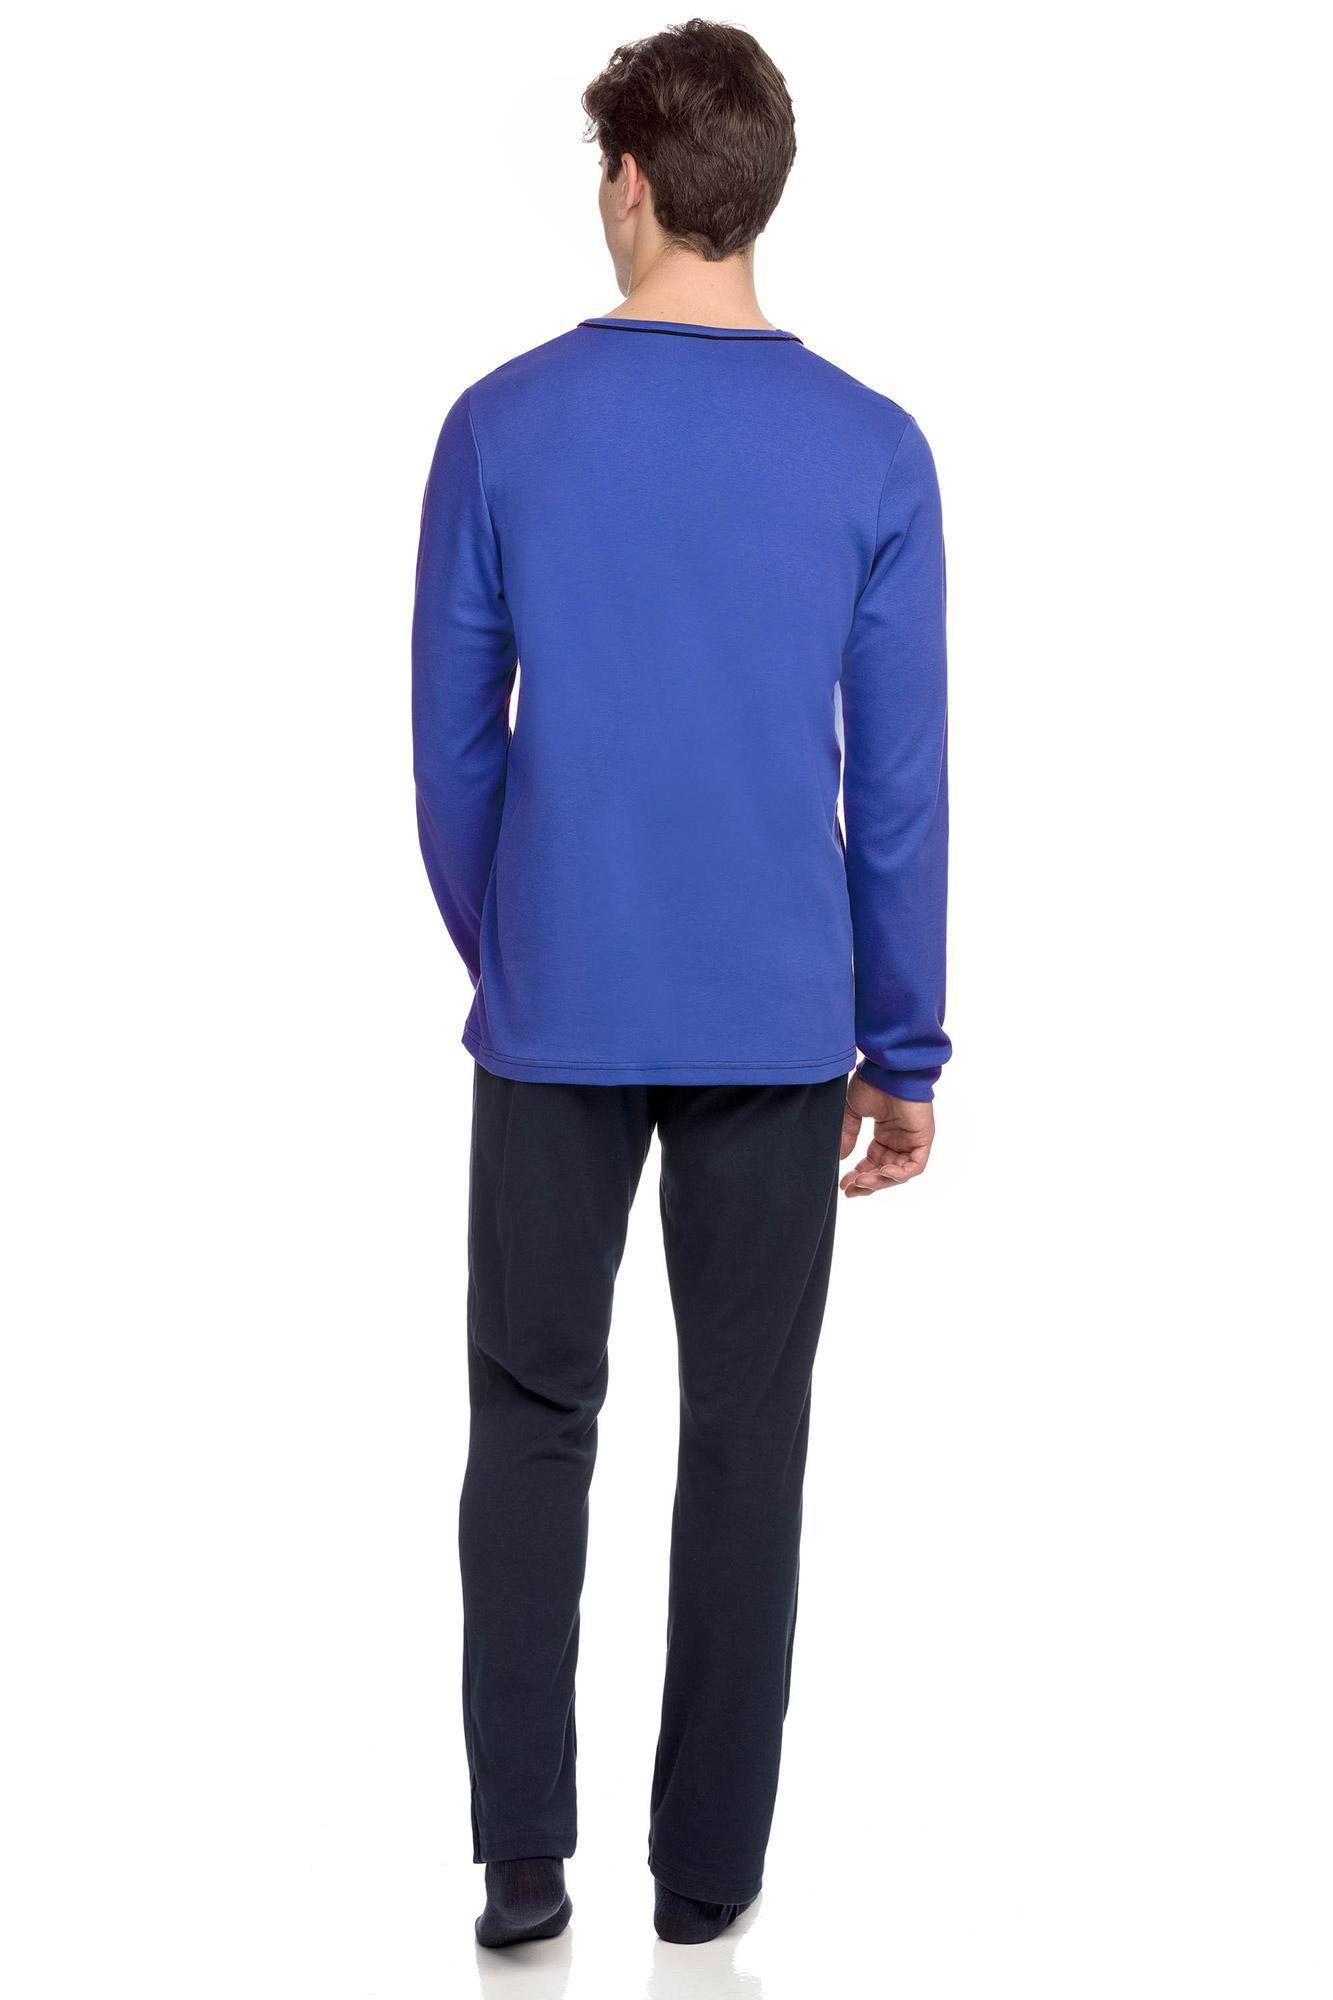 Men's Cotton Pyjamas with cuffs